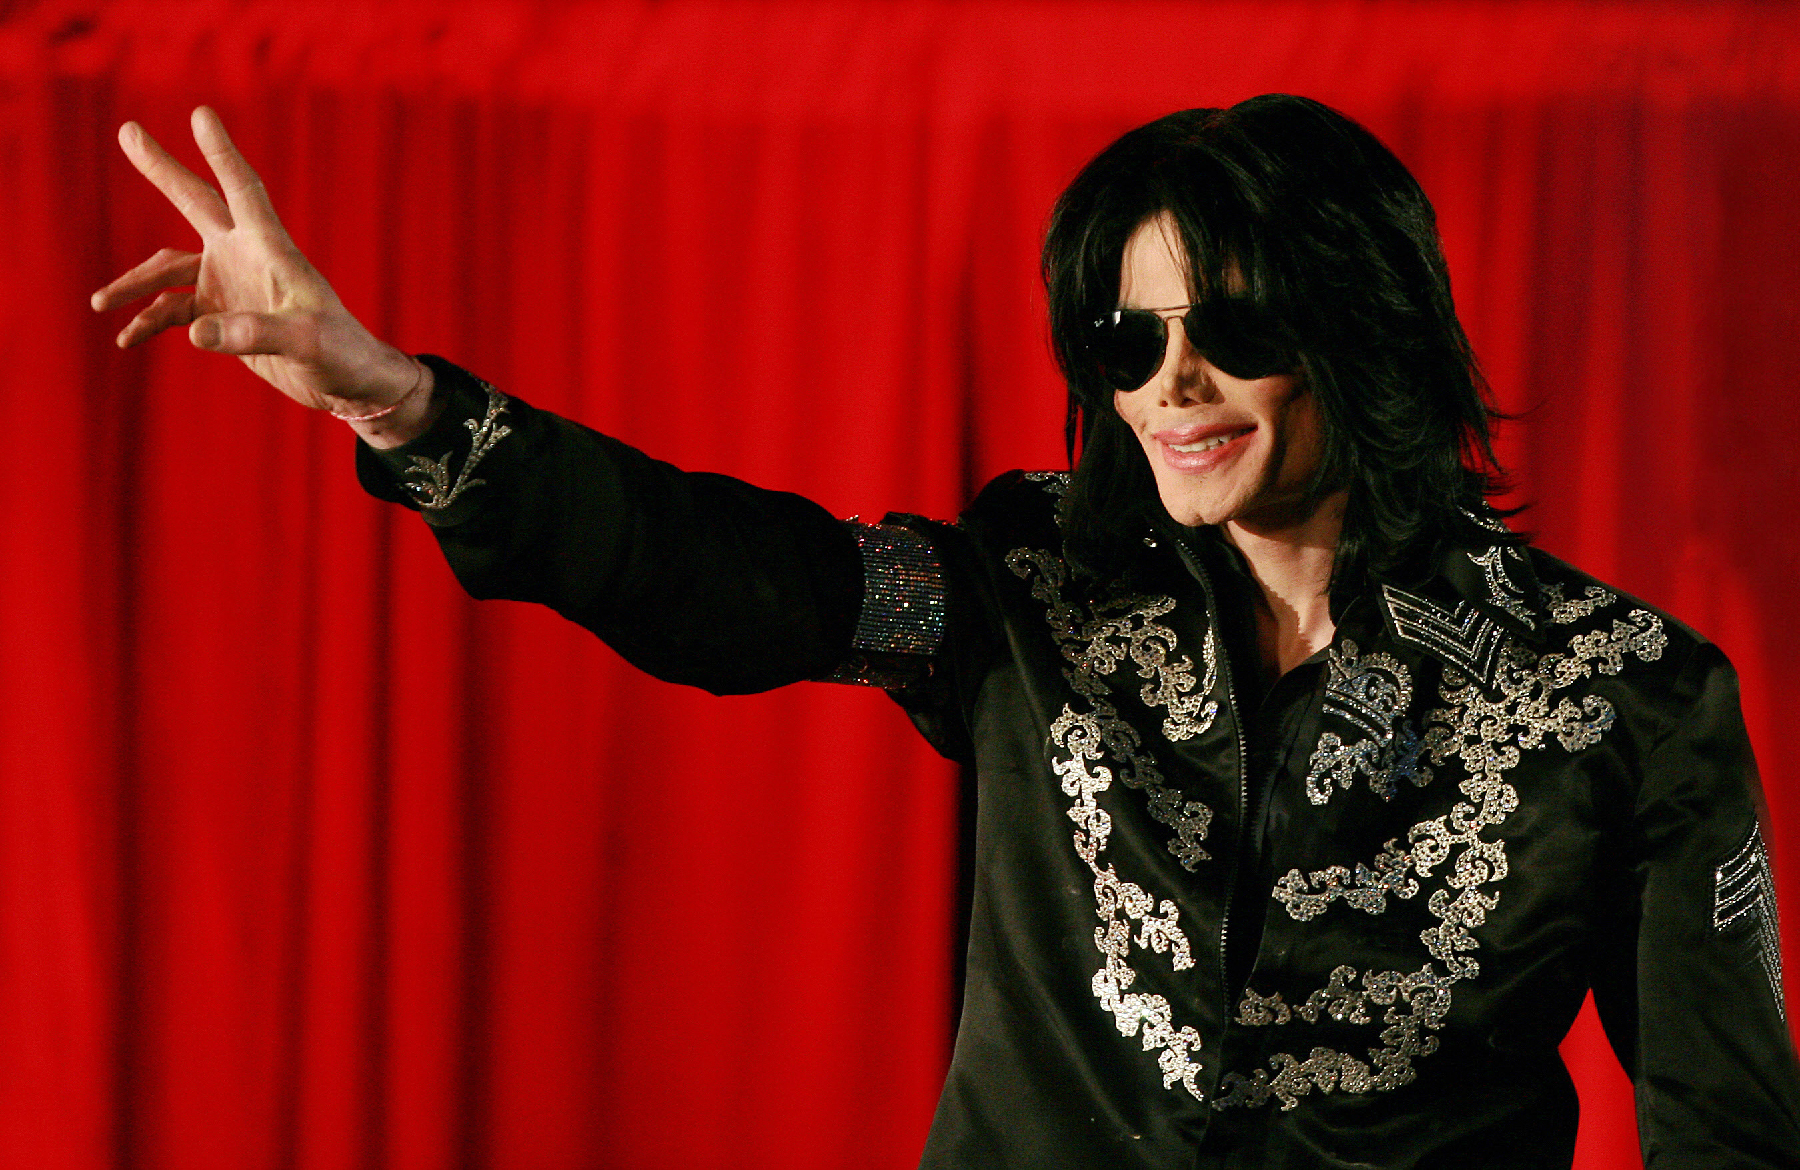 5 Michael Jackson Fans Awarded $1.36 Each Over Singer's Death